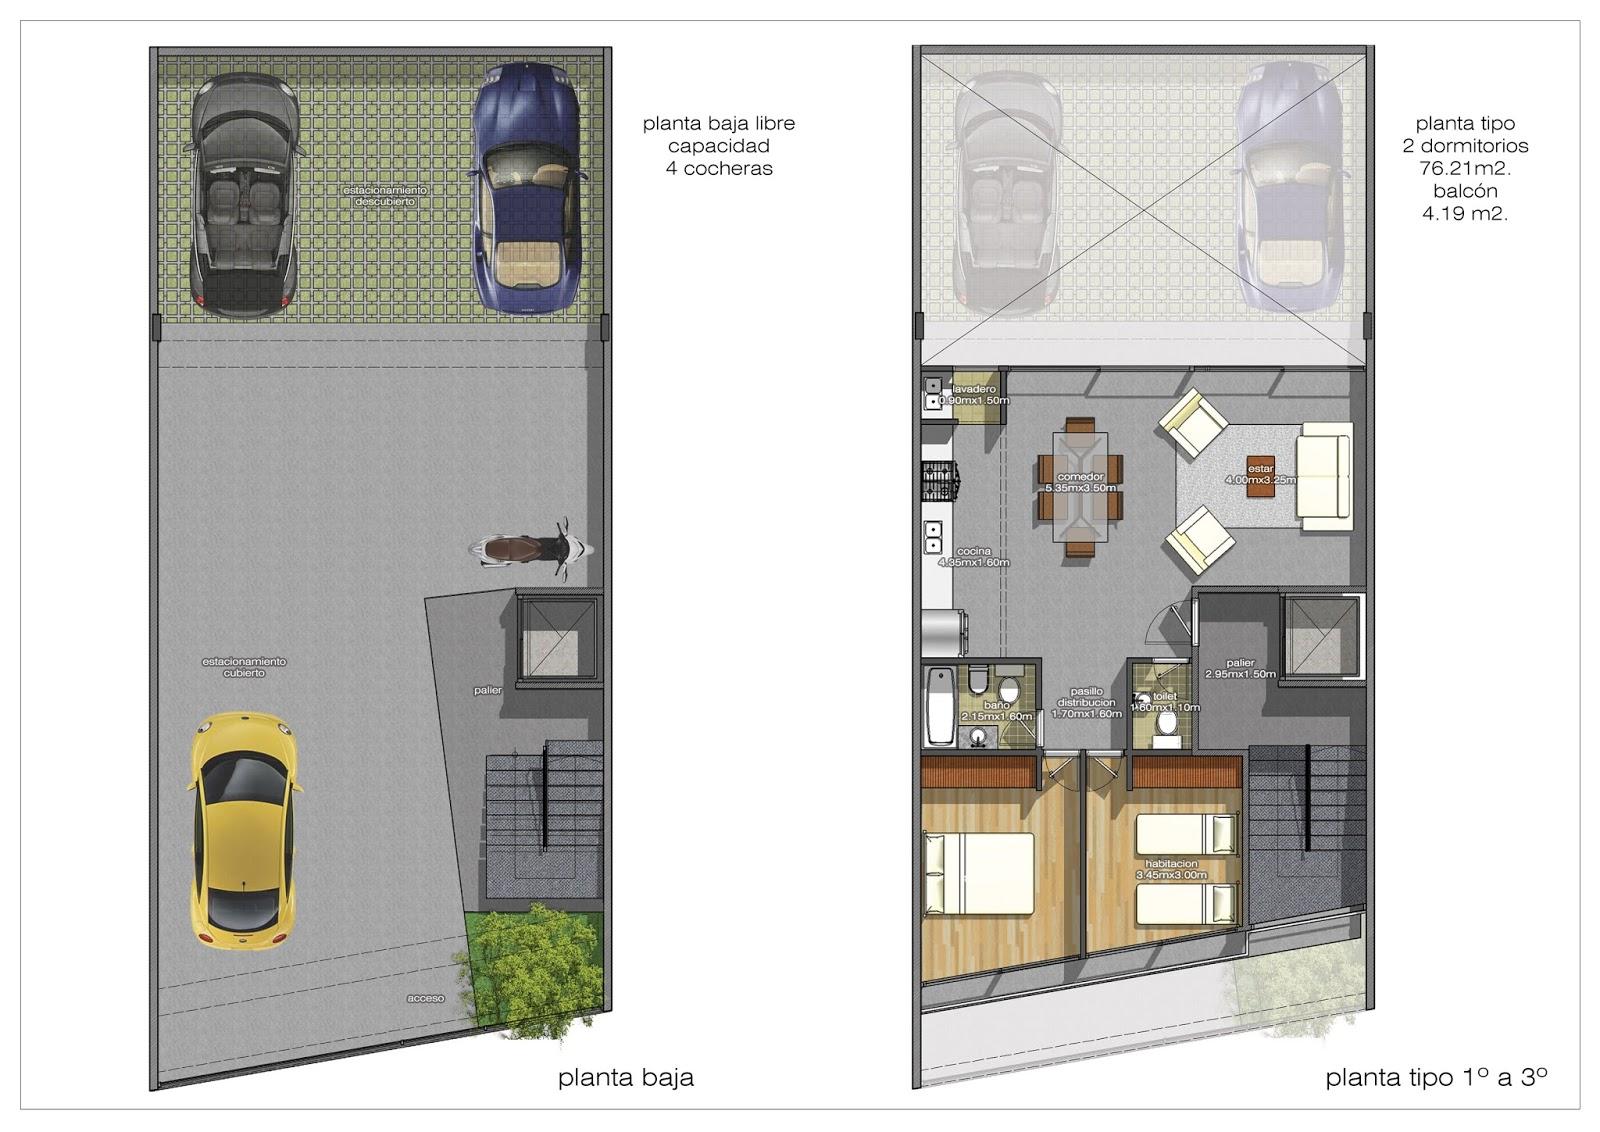 Arquitectura y dise o proyecto for Arquitectura planos y disenos